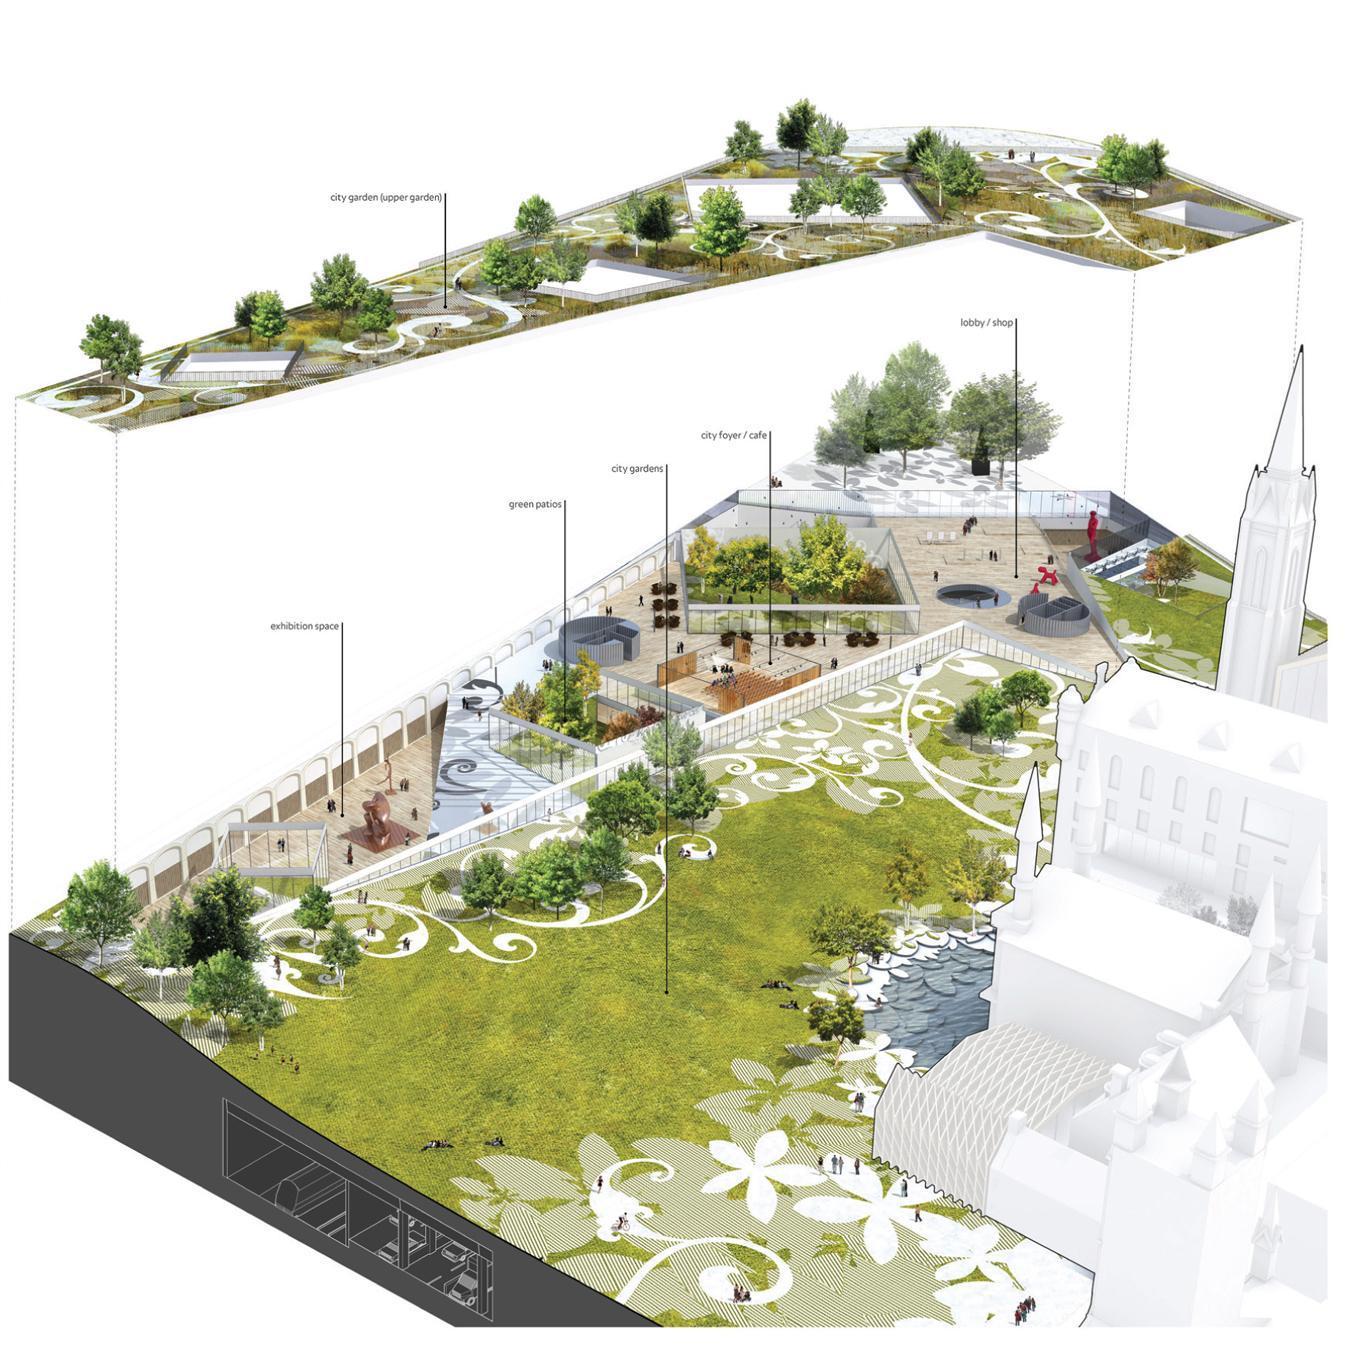 A f a s i a mecanoo cooper cromar ian white landscape for Landscape architecture